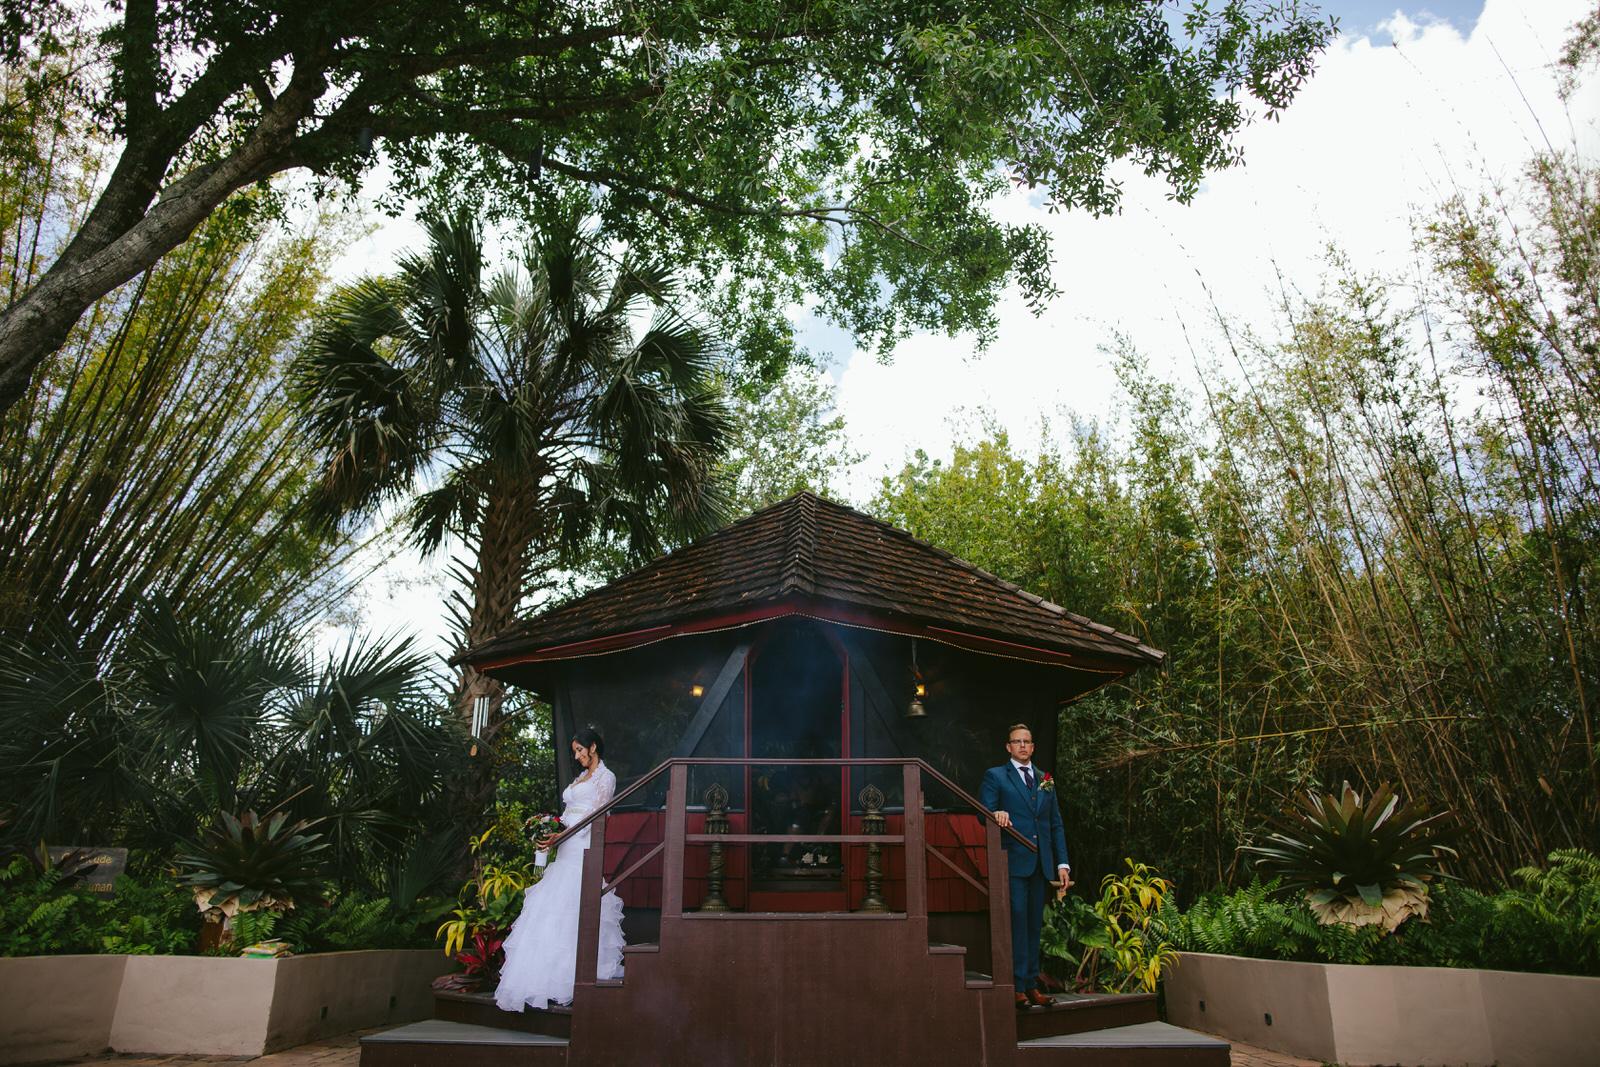 kashi-wedding-portraits-bride-and-groom-tiny-house-photo-weddings-3.jpg